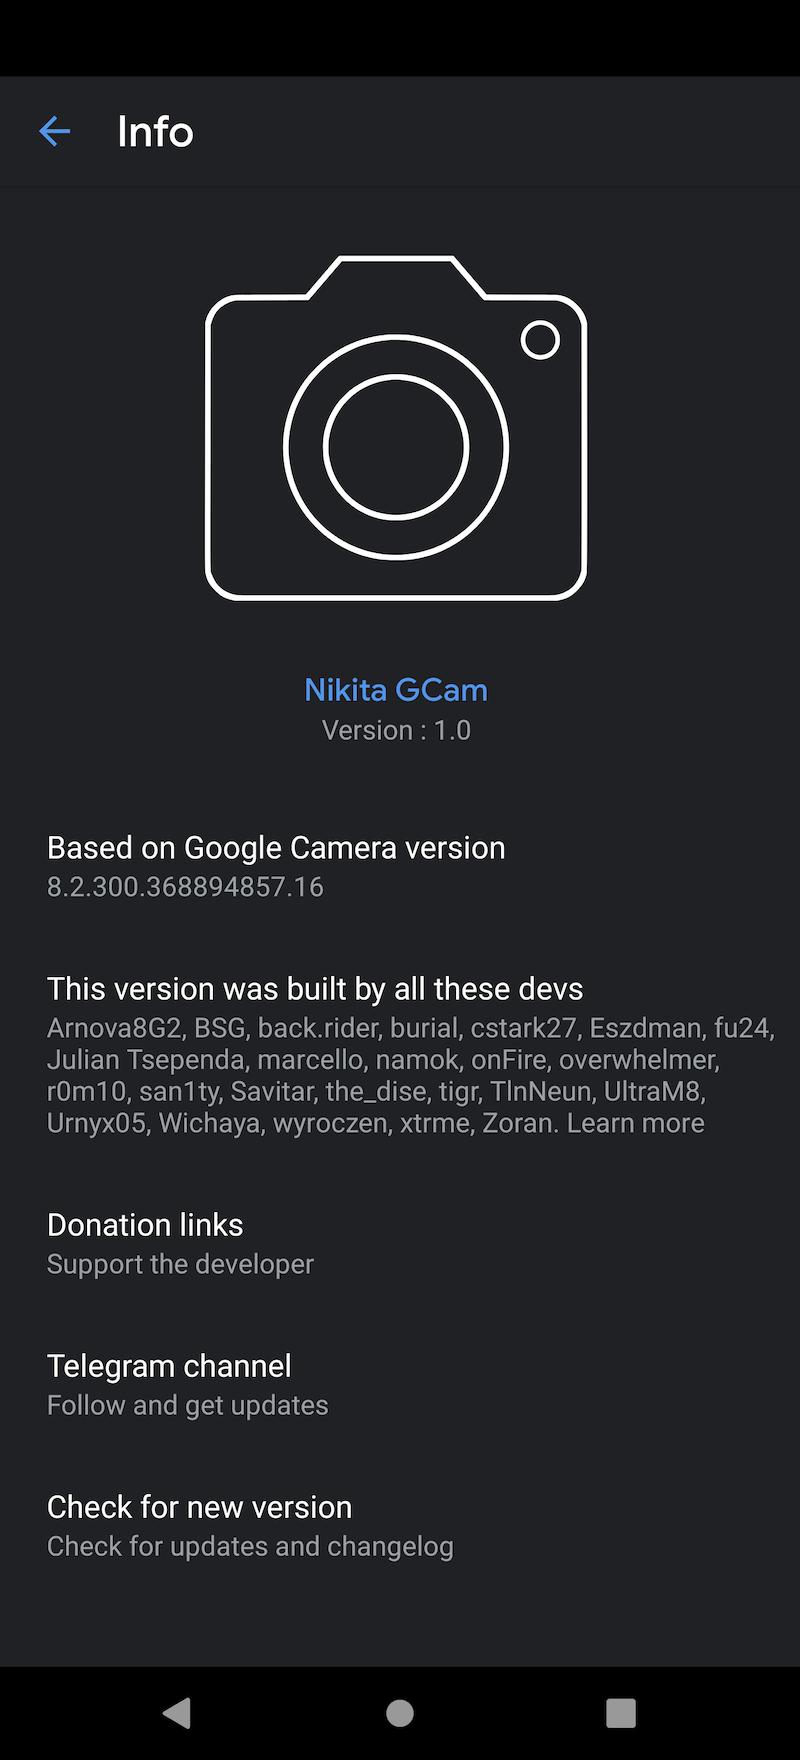 NGCam_8.2.300-v1.0